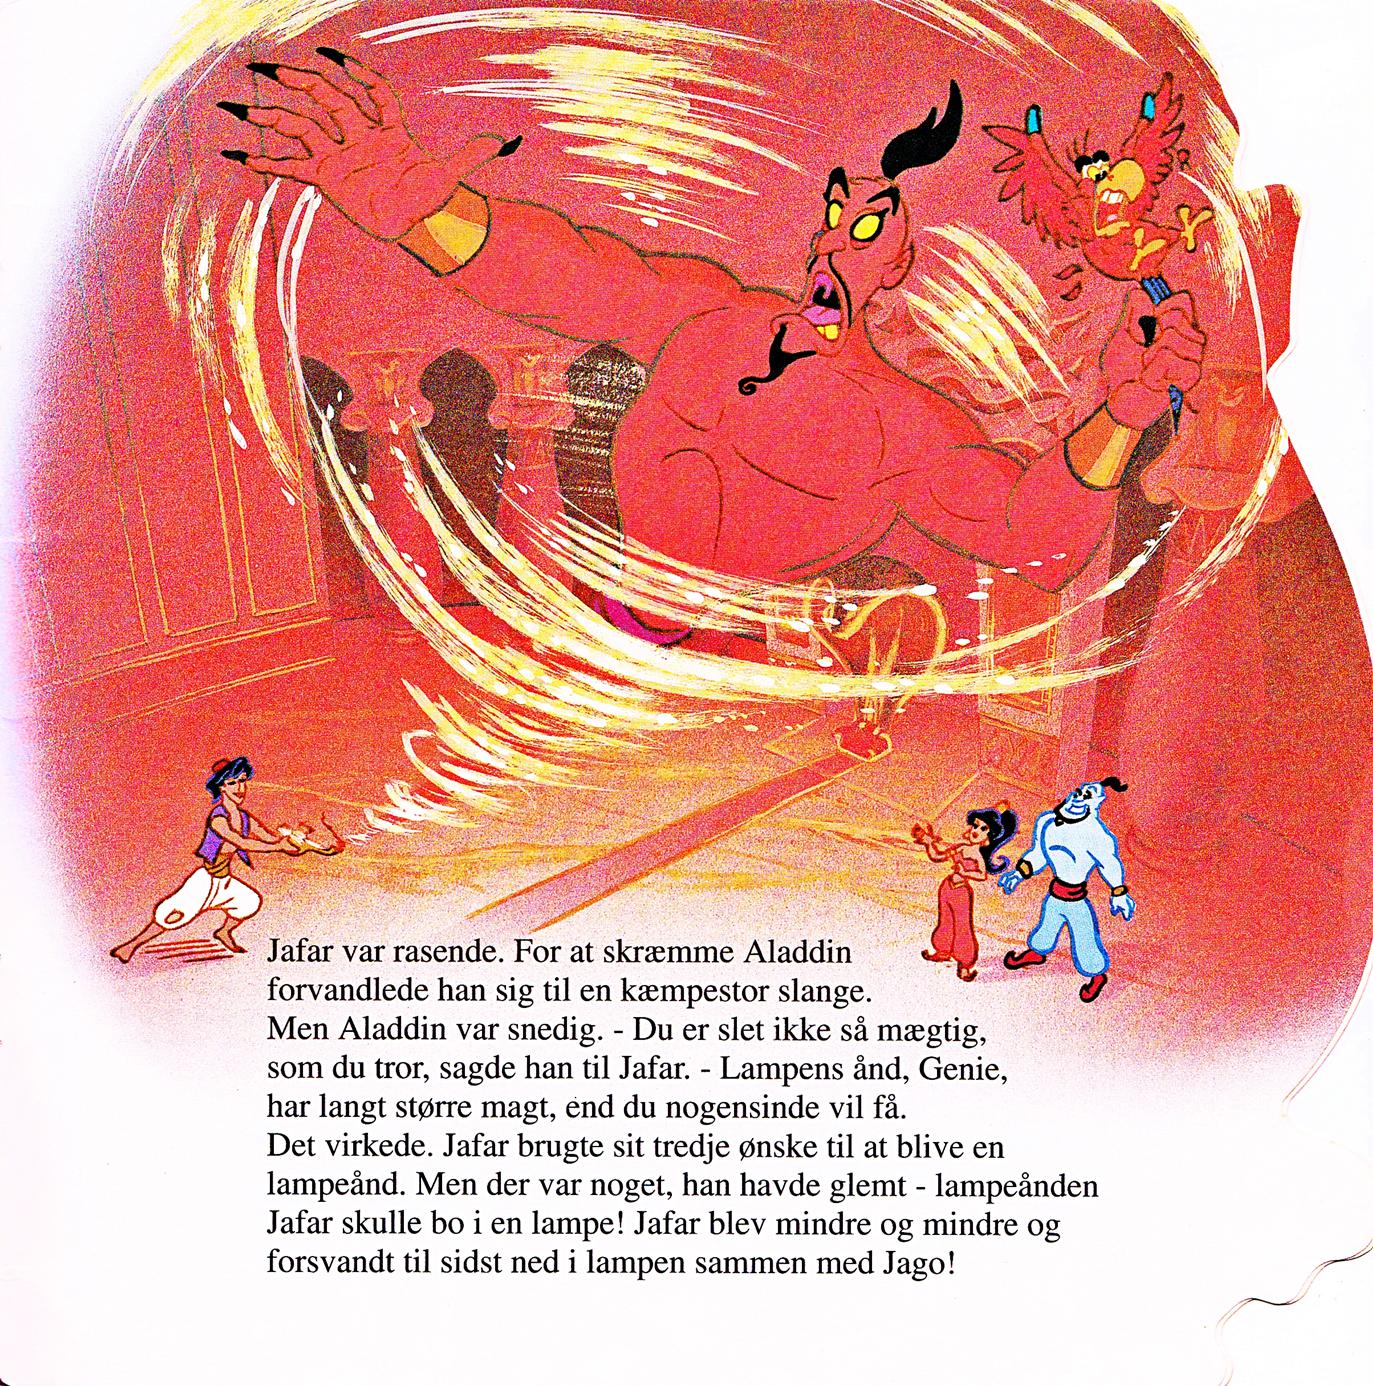 Walt Дисней Book Scans – Aladdin: The Genie's Story (Danish Version)